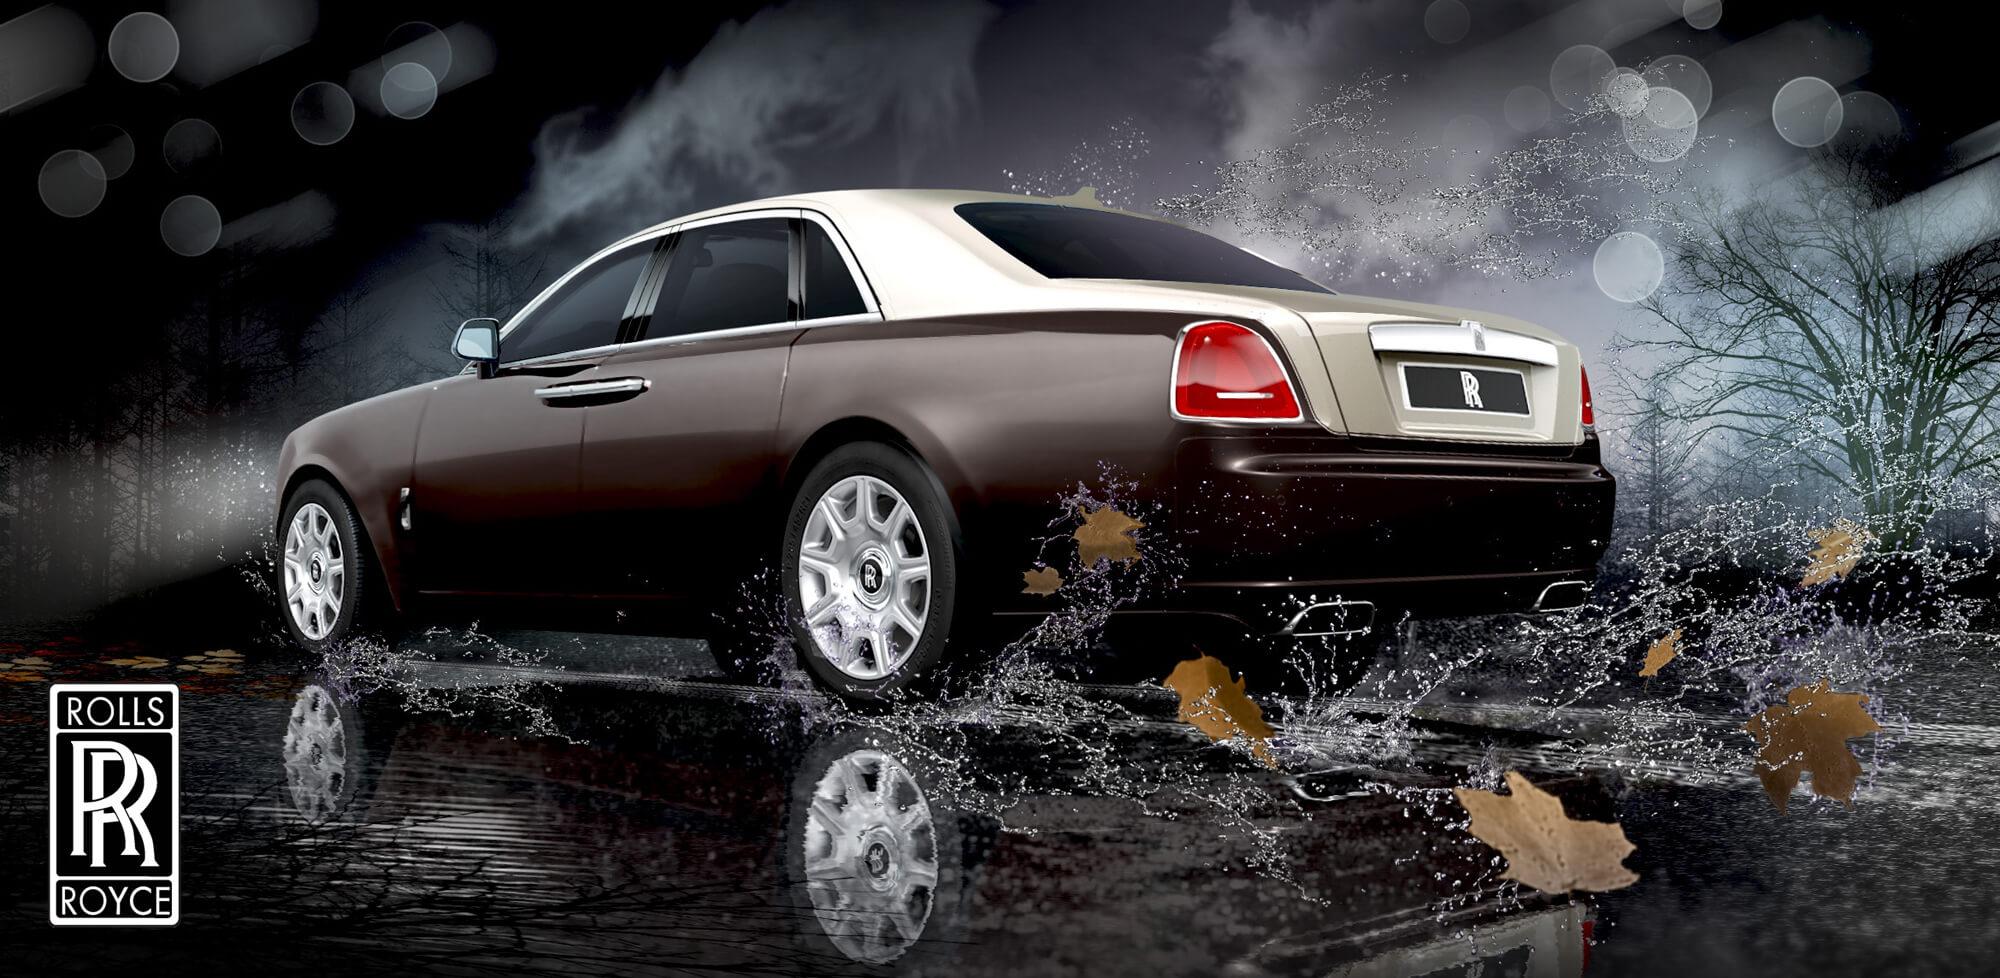 Rolls_Royce_Print_Ads_4.jpg